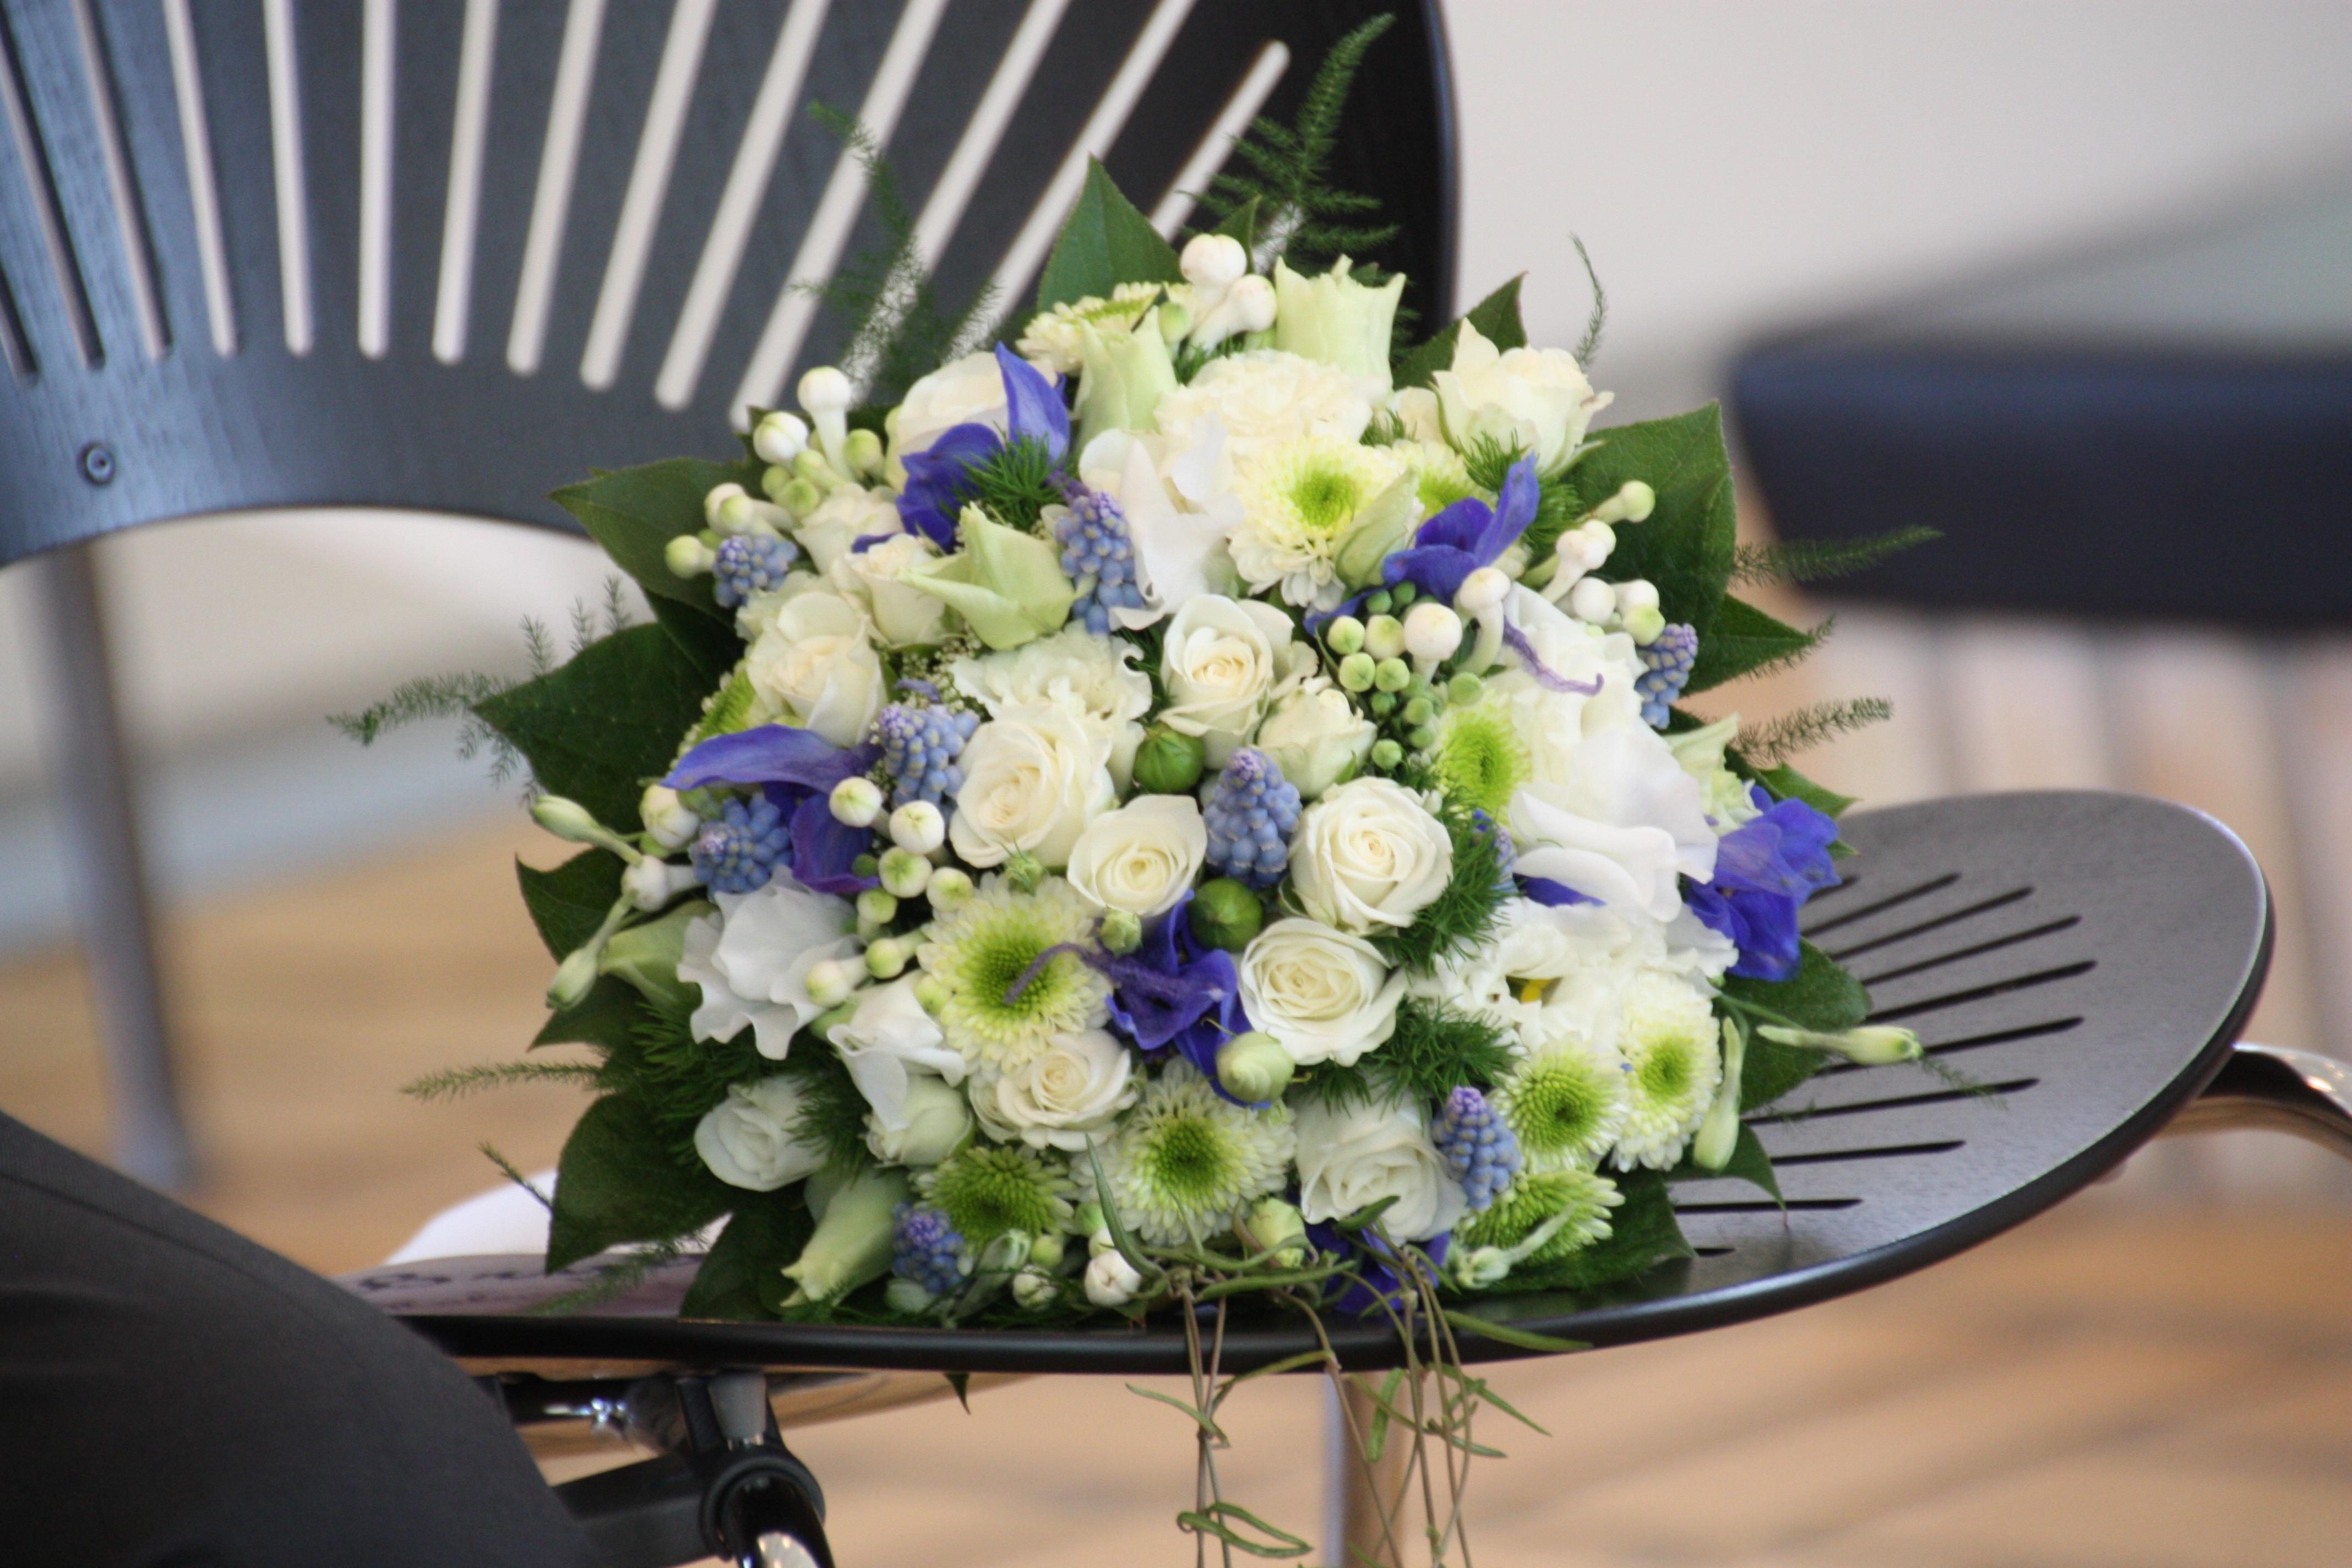 Free Images : plant, white, rose, romance, blue, wedding, flora ...